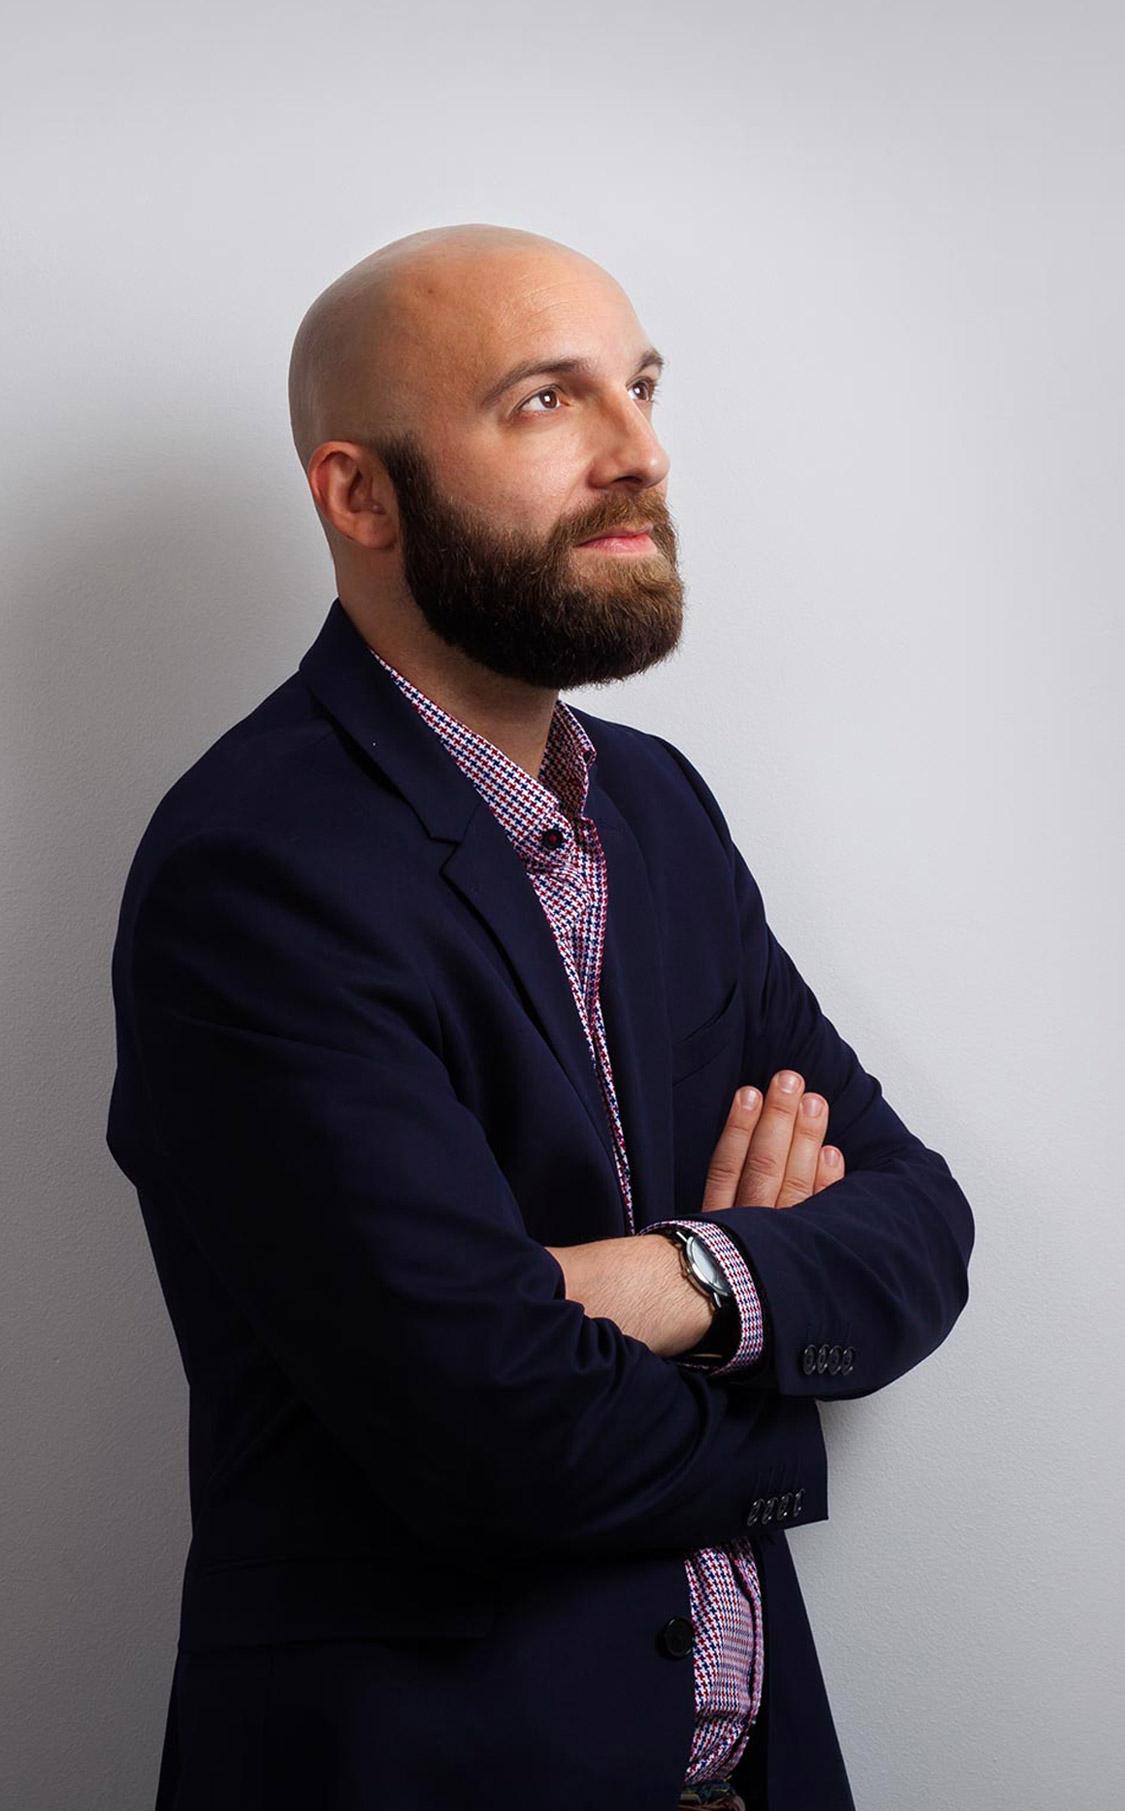 Baptiste Firroloni